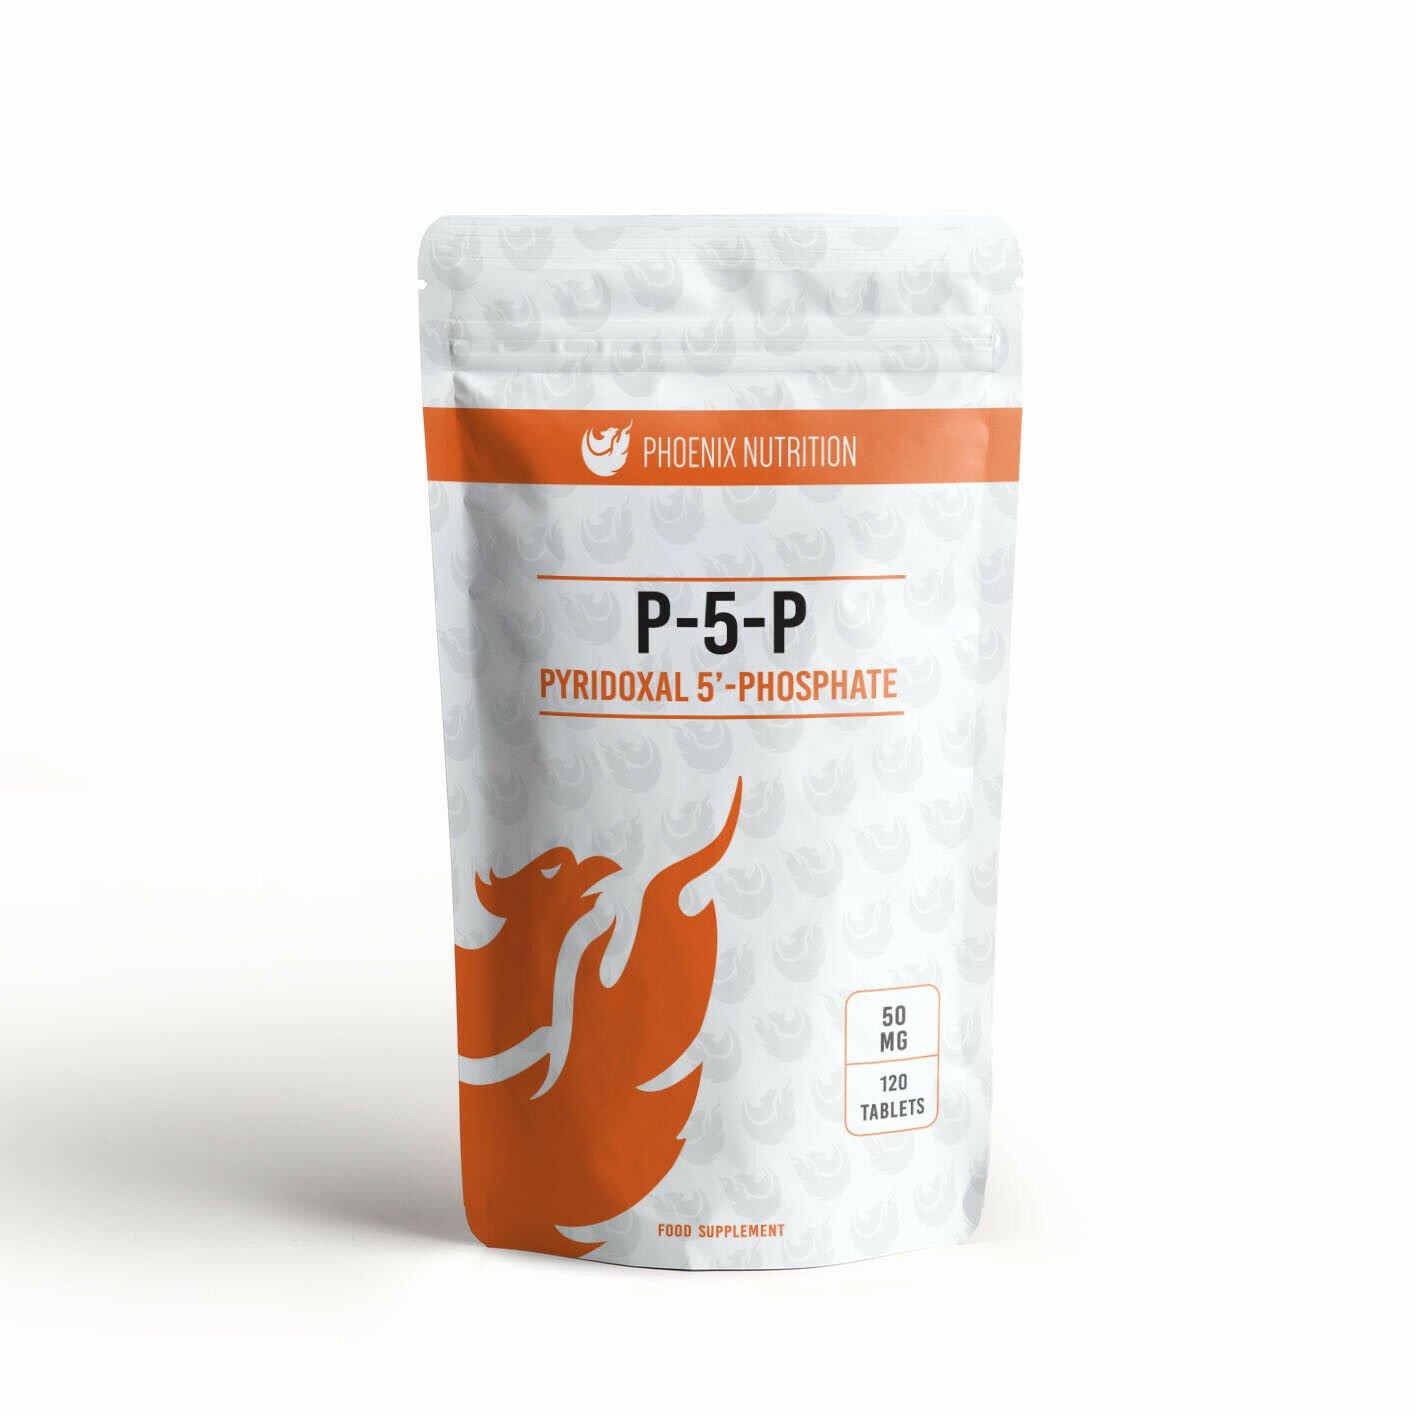 P-5-P 50mg x 120 Tablets - Pyridoxal 5' Phosphate, Coenzyme Vitamin B6 P5P